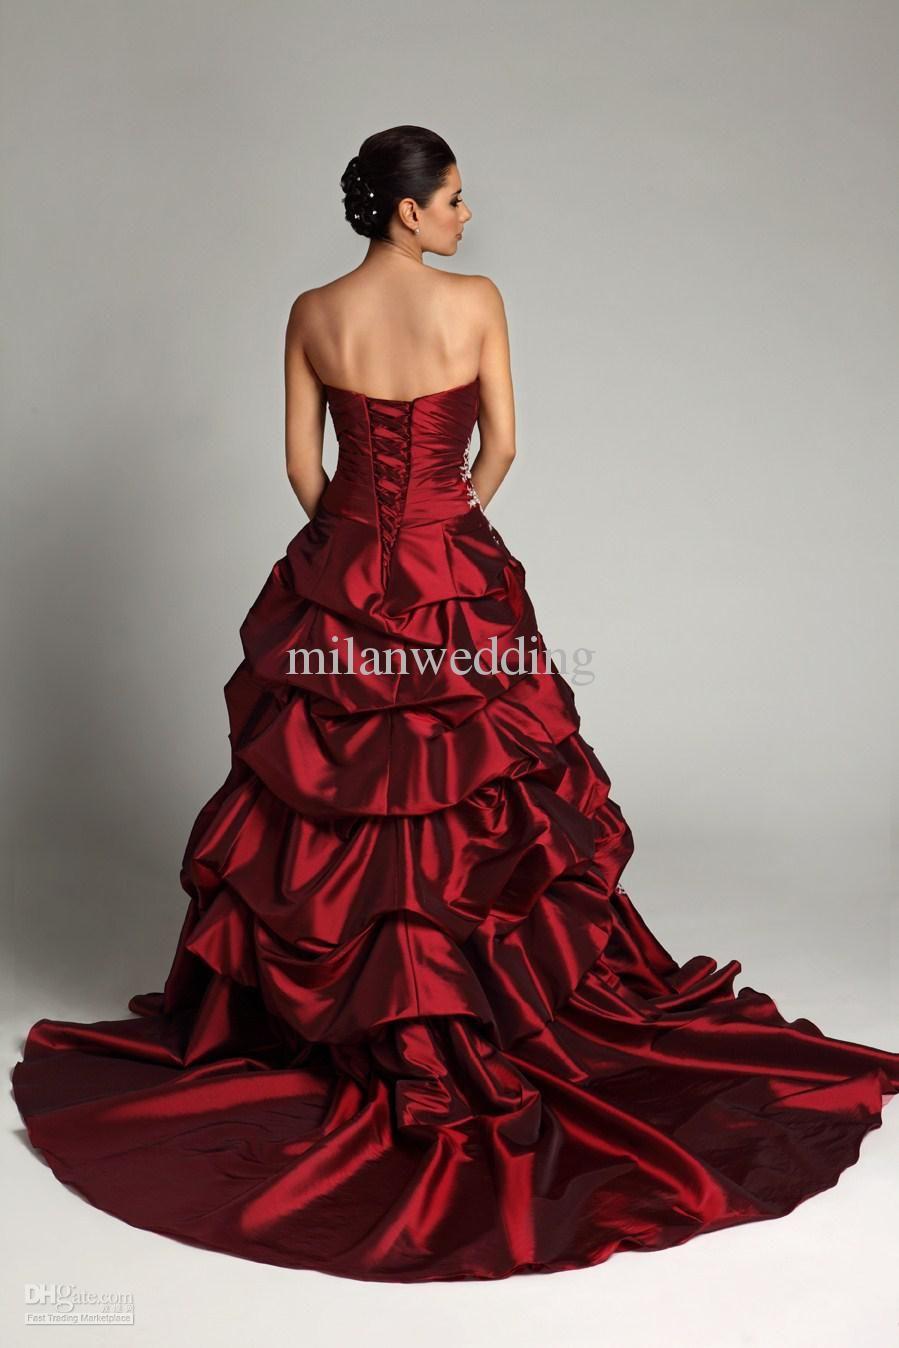 red-wedding-dress-for-allure-dark-red-wedding-dresses-satin-applique ...